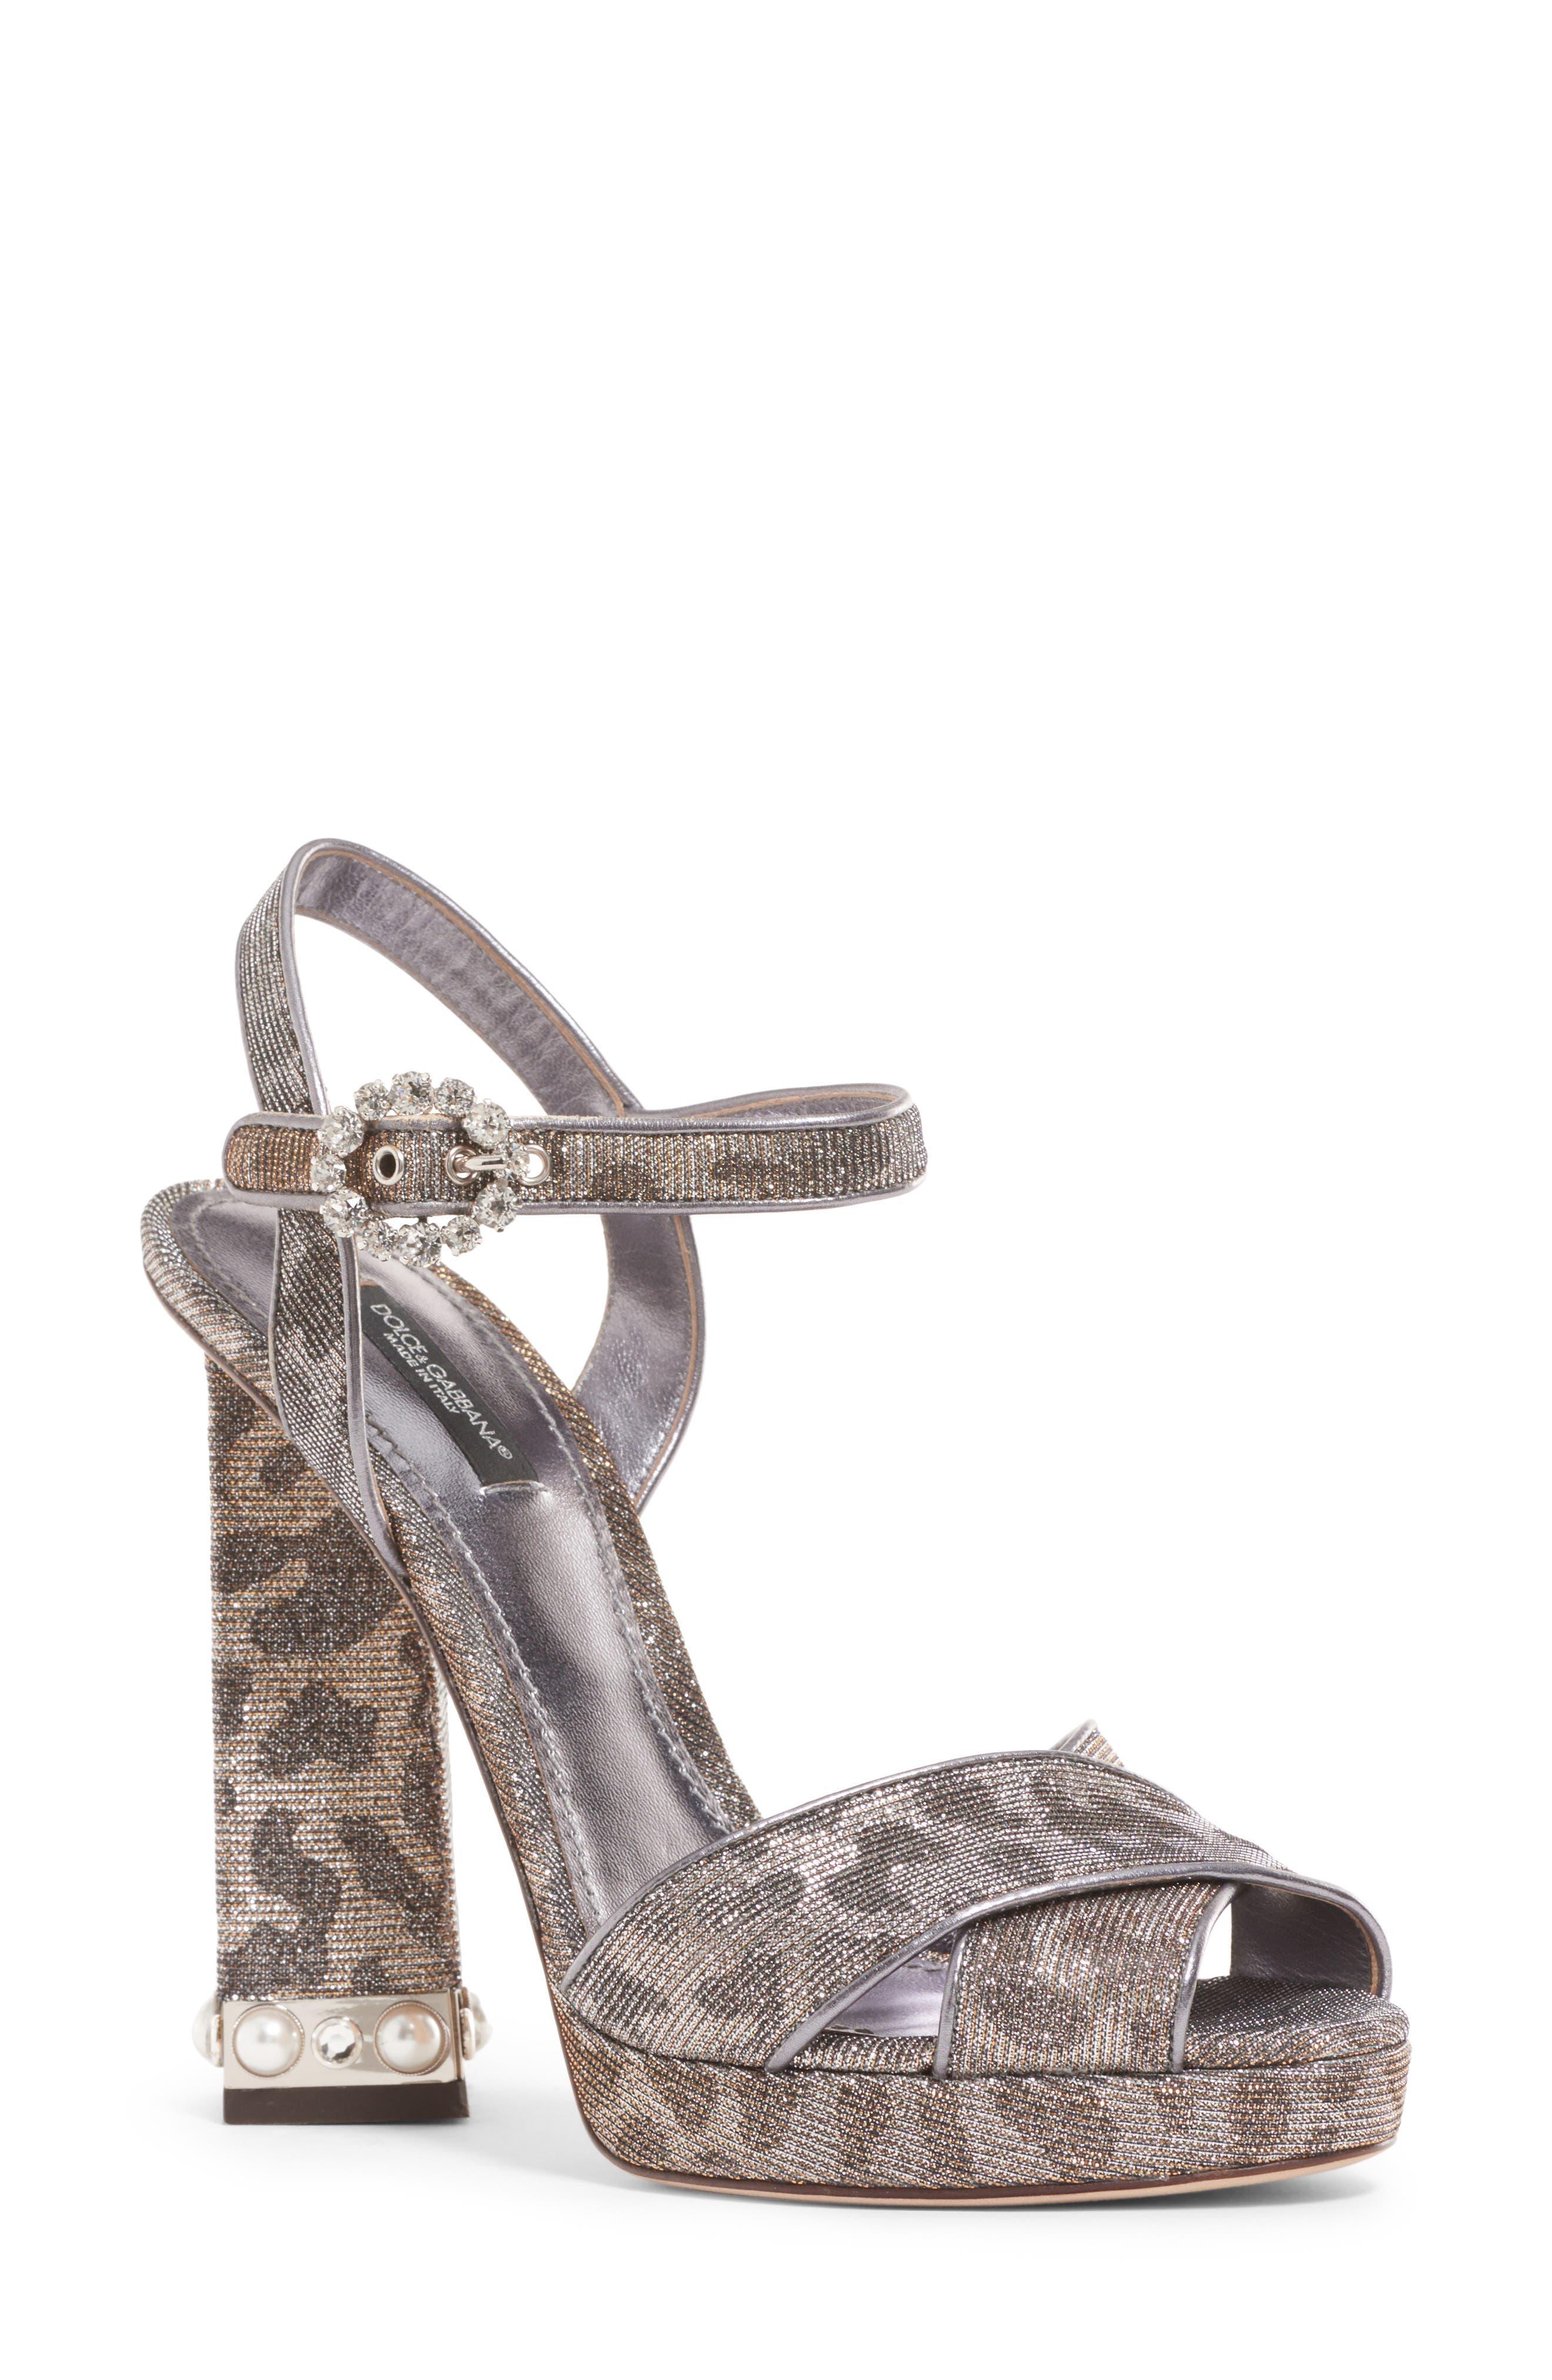 Main Image - Dolce&Gabbana Metallic Leopard Print Sandal (Women)